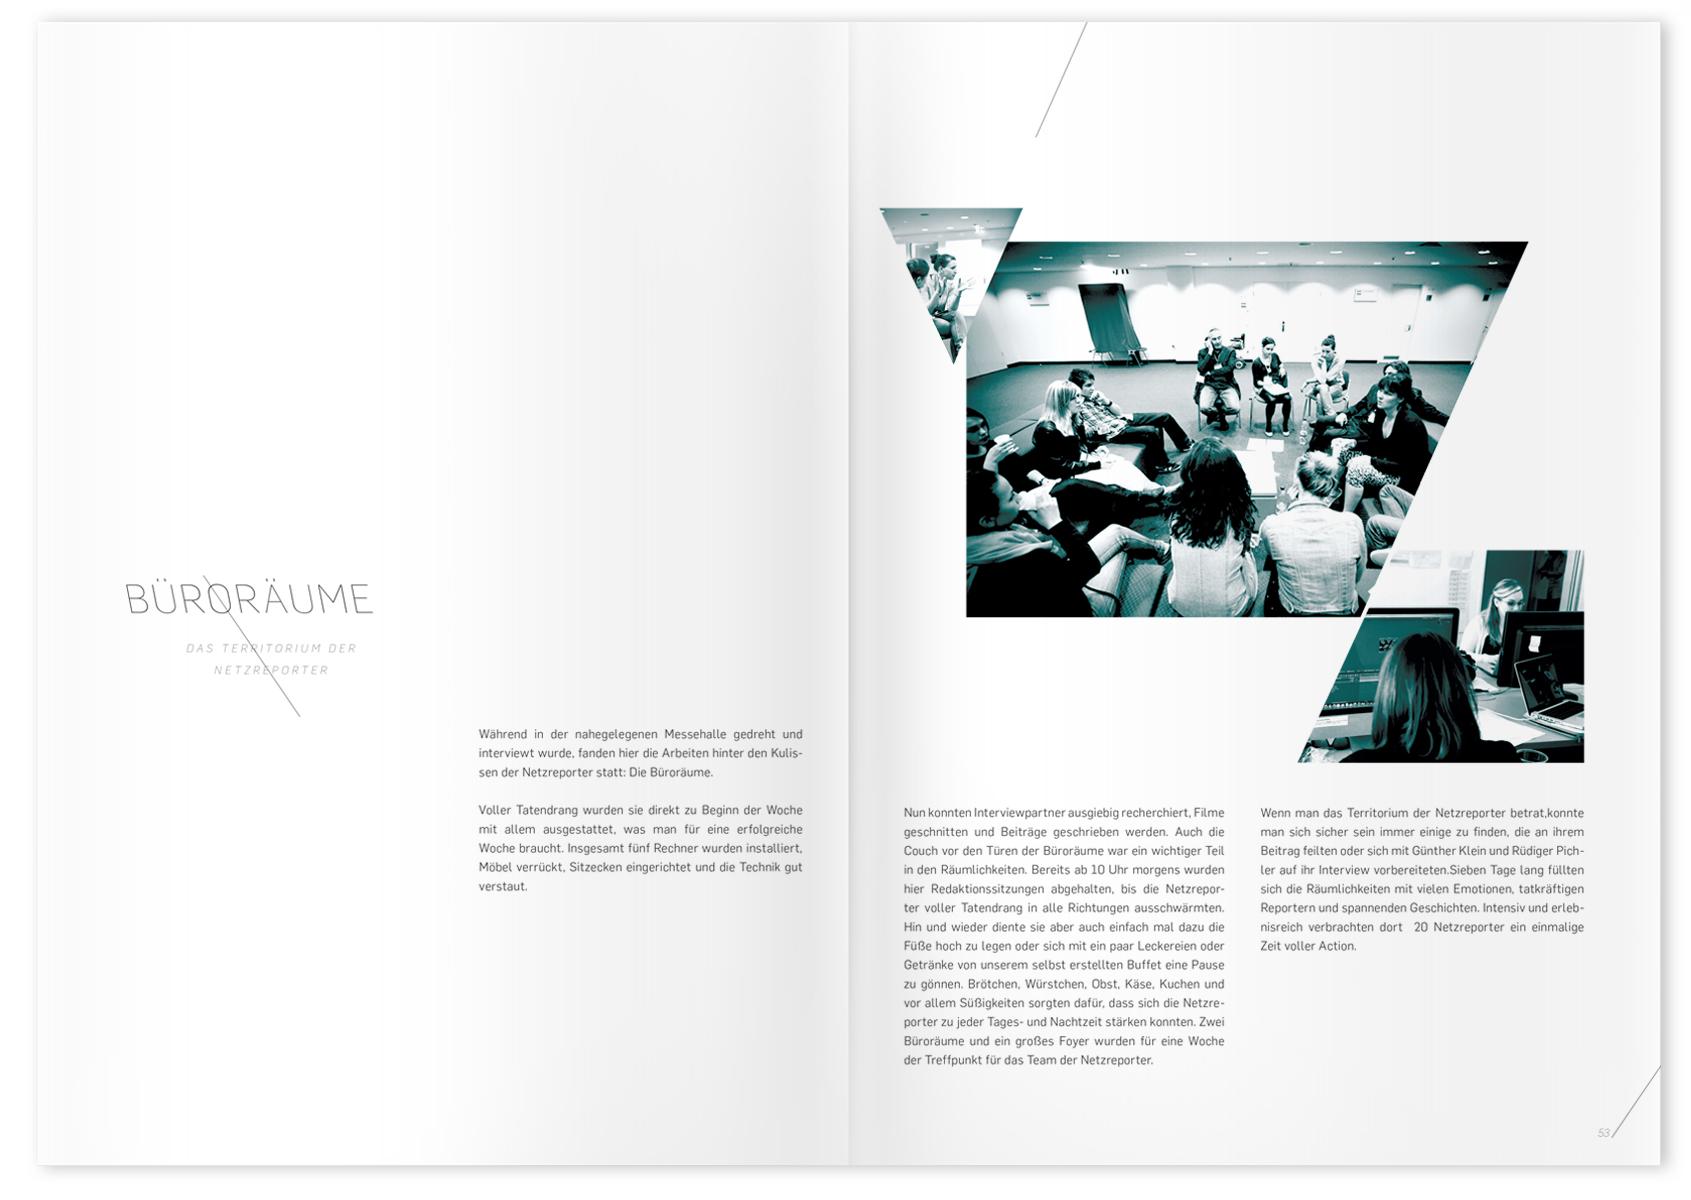 04_hFMA Netzreporter_ADC Festival_Editorial Design_Grafikdesign_Gloria Kison.jpg